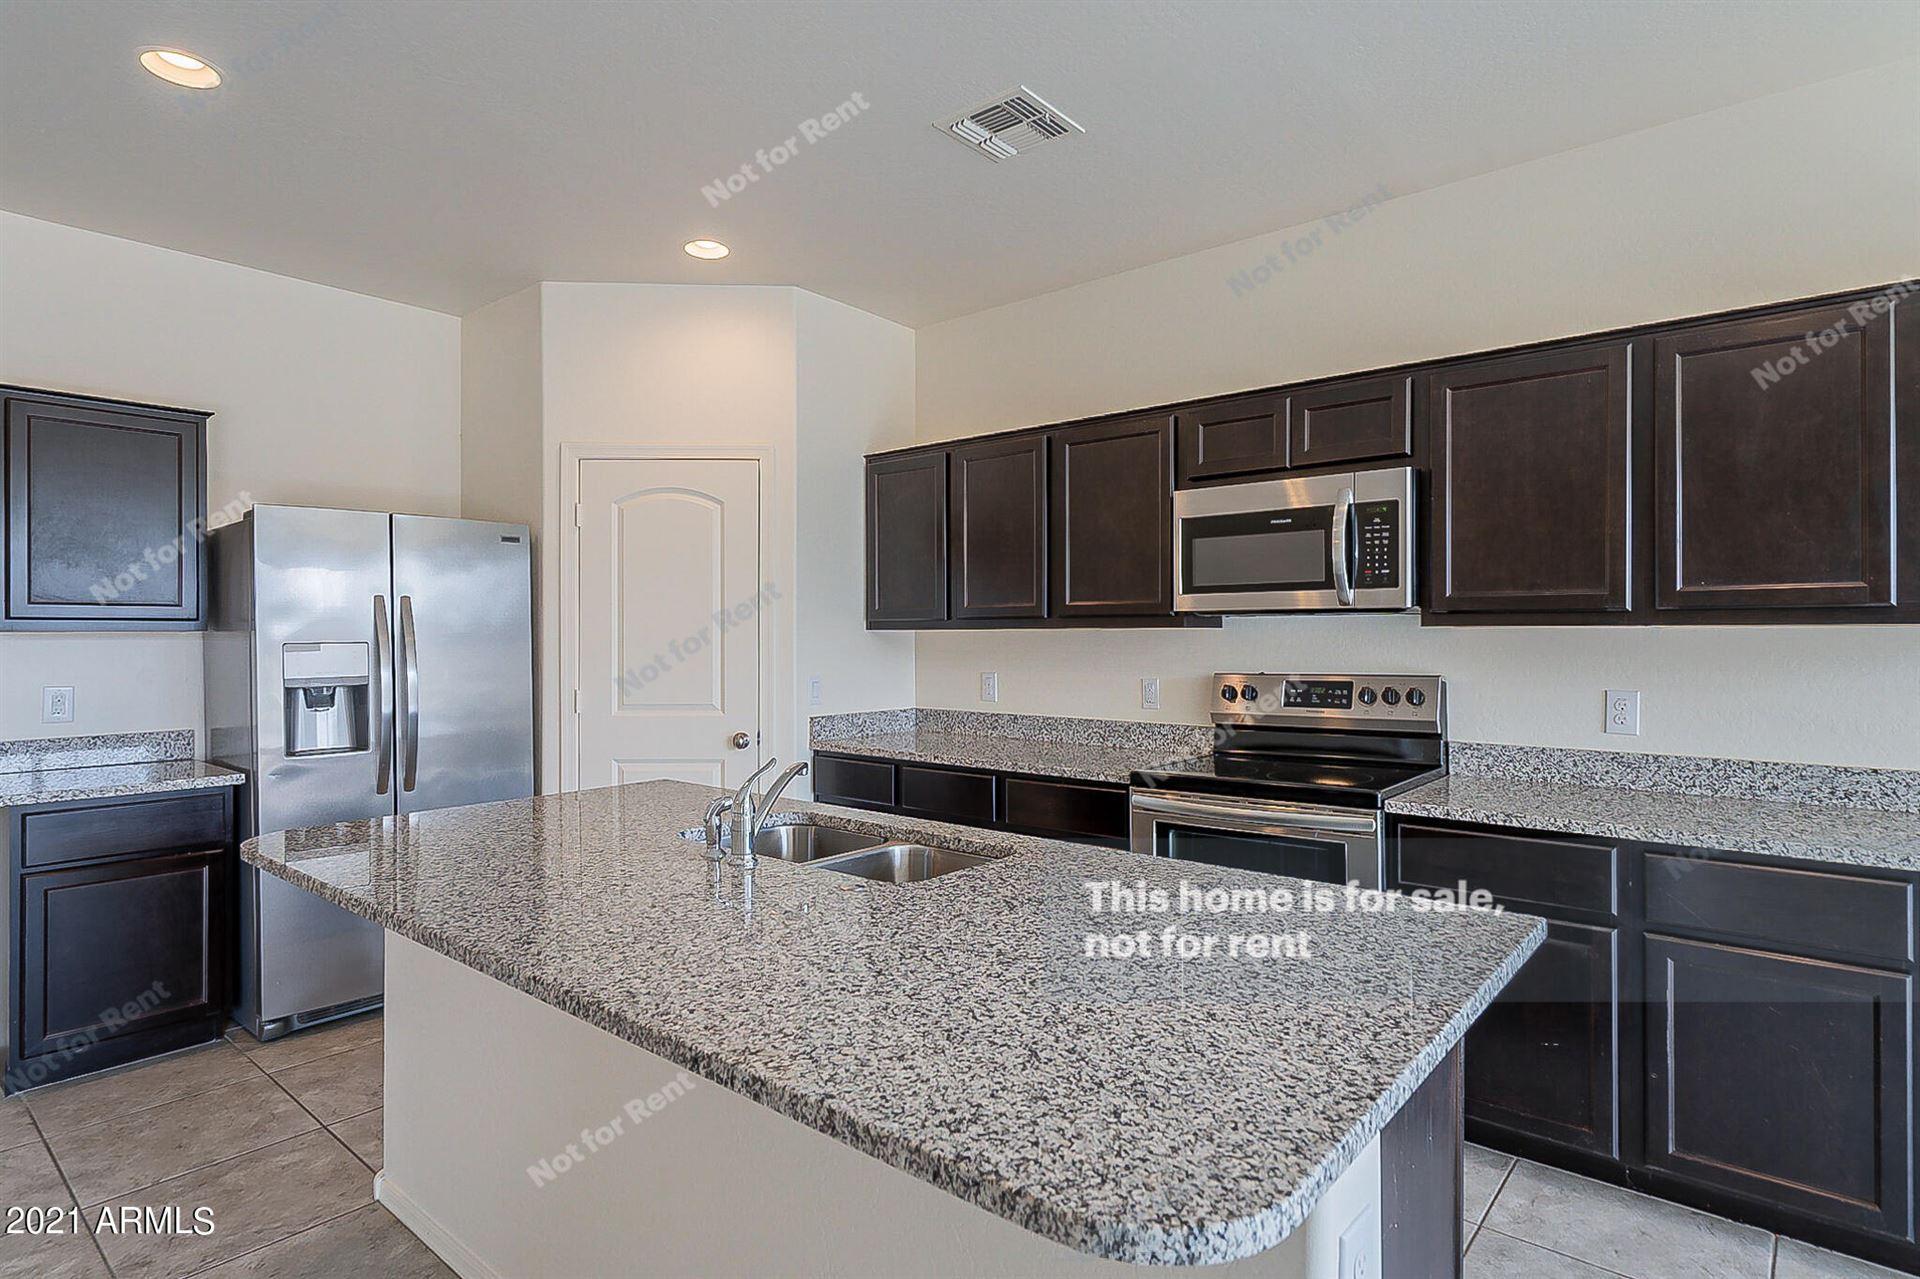 Photo of 37685 W AMALFI Avenue, Maricopa, AZ 85138 (MLS # 6296307)